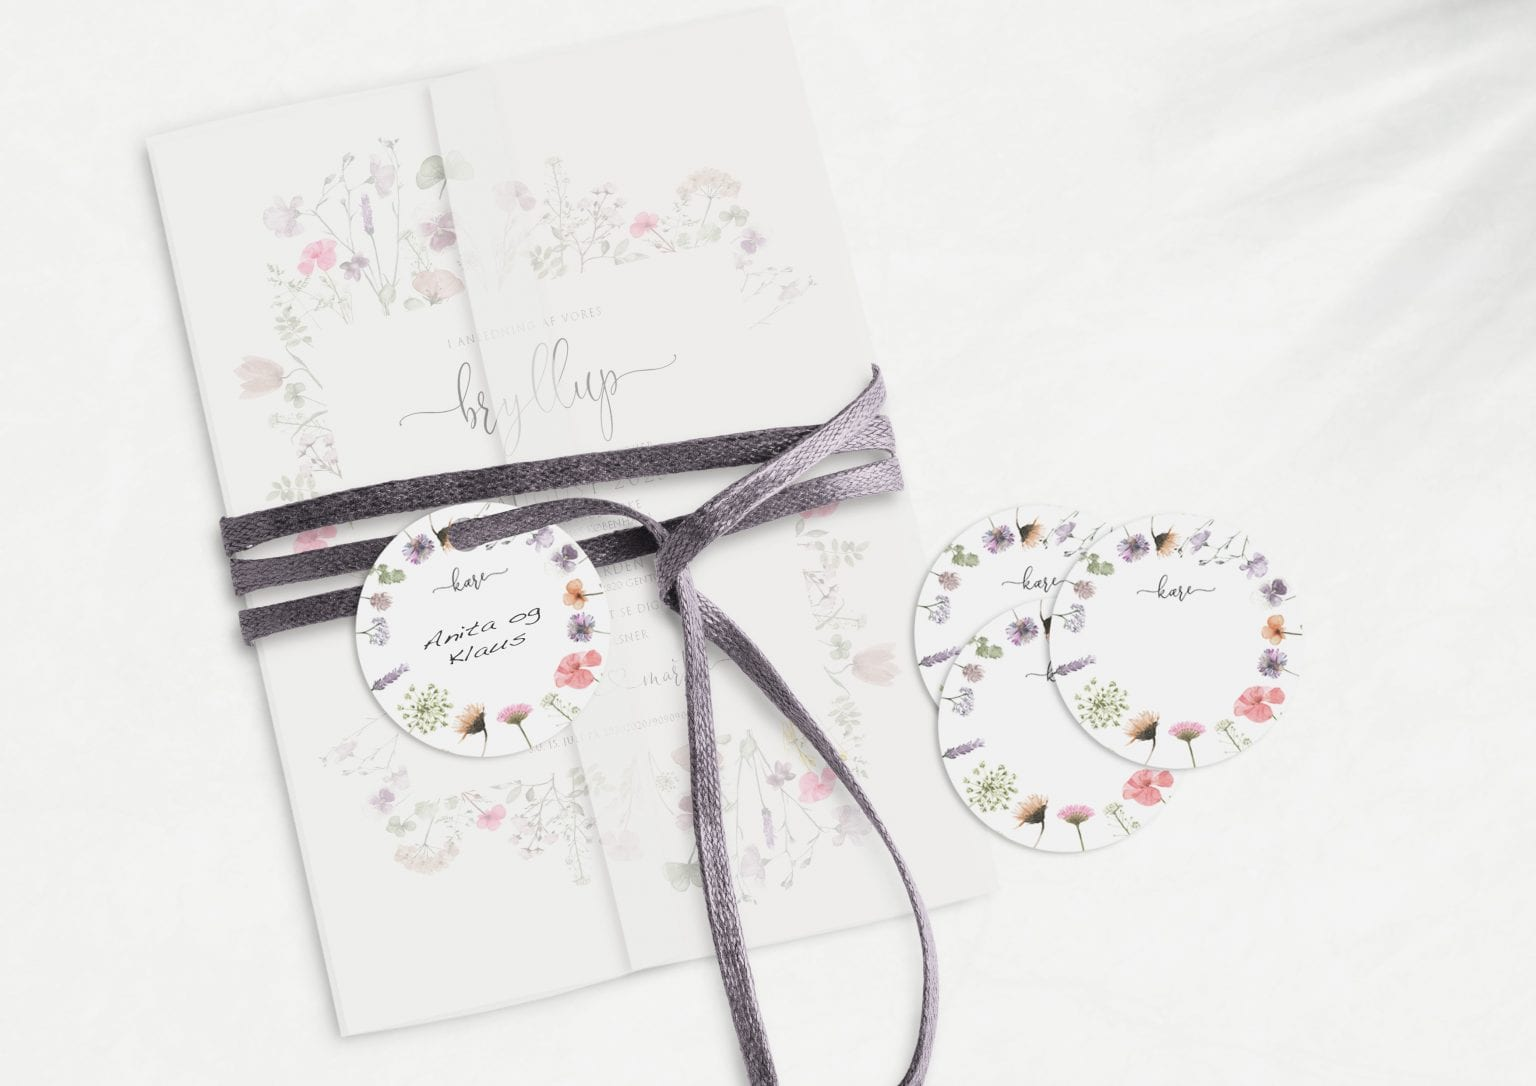 Pressed Flowers, manillamærke, bryllup